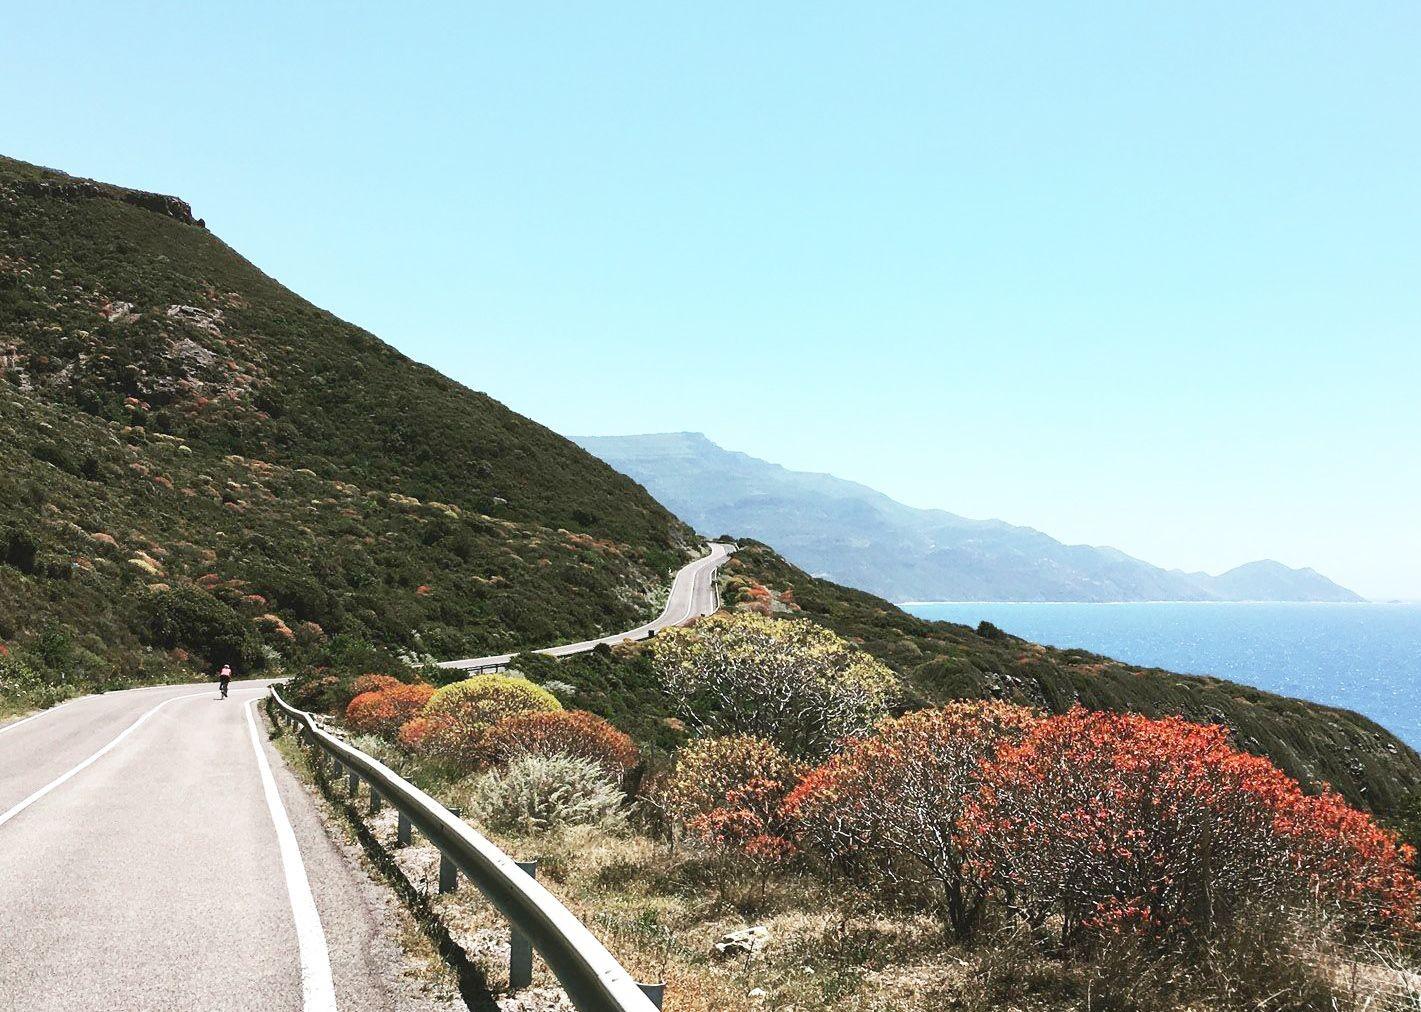 Road-Cycling-Holiday-Italy-Sardinia-Coastal-Explorer-Montiferru.jpg - Italy - Sardinia - Coastal Explorer - Self Guided Road Cycling Holiday - Italia Road Cycling